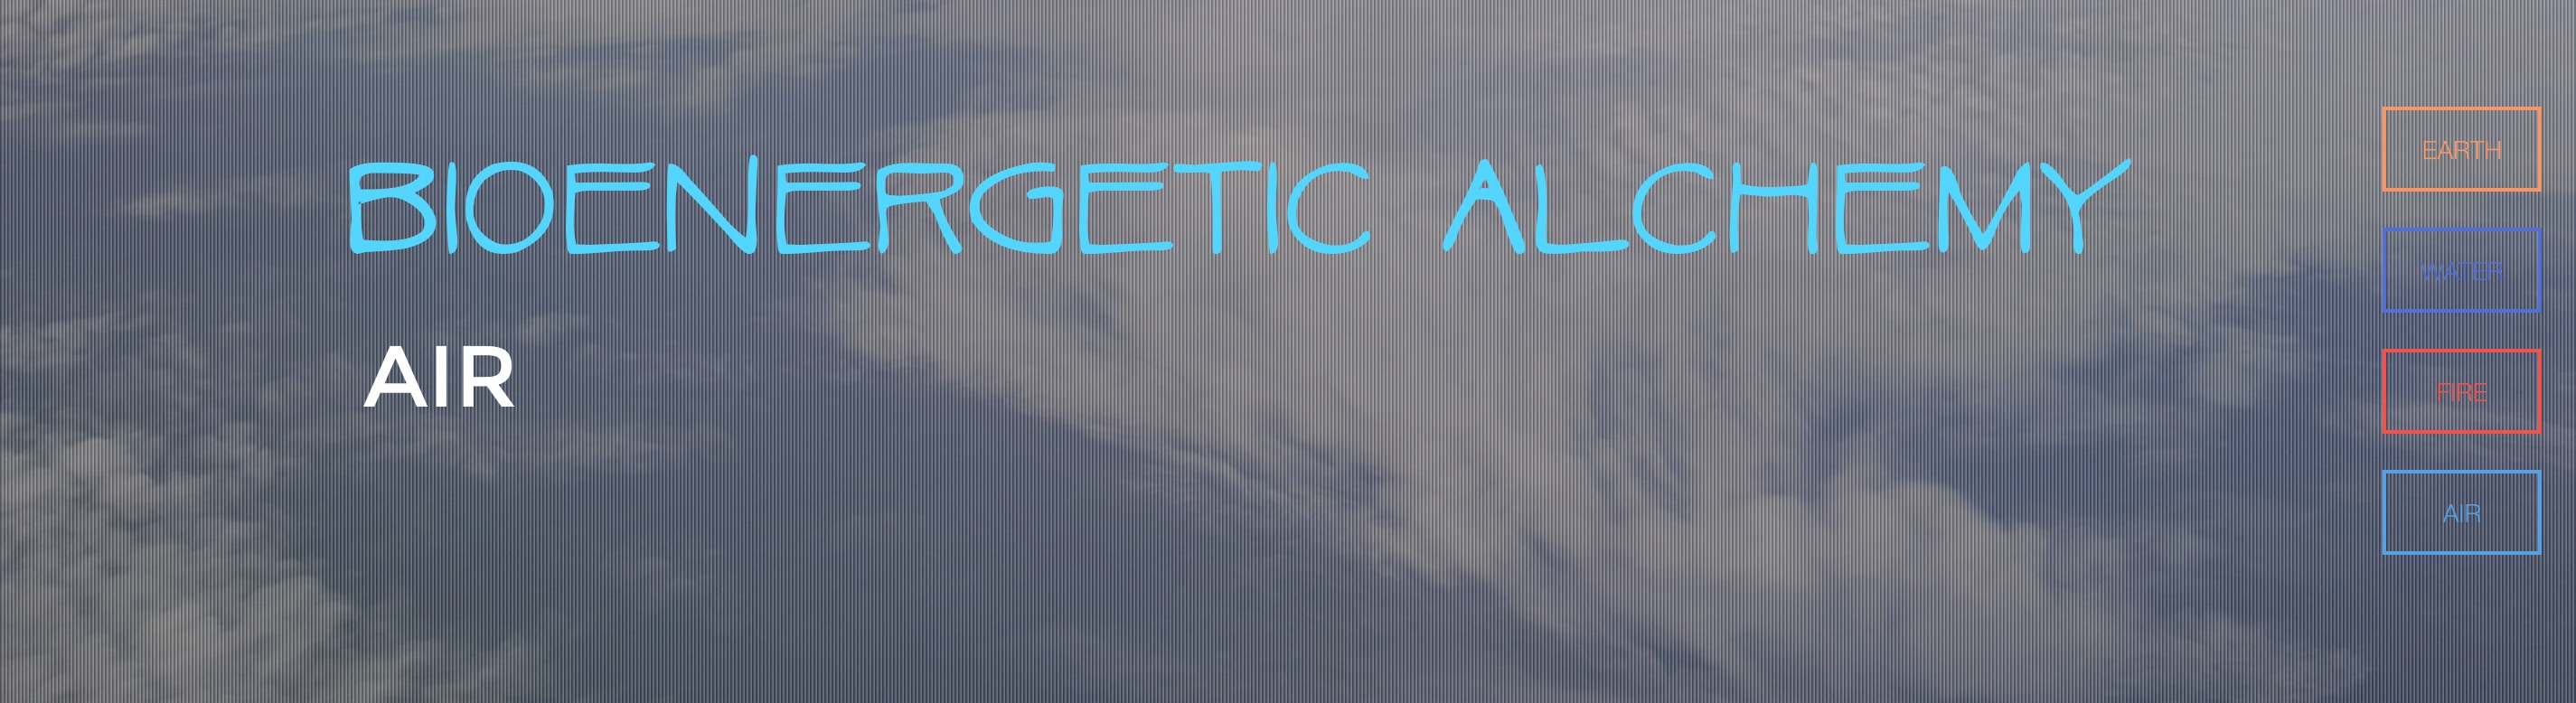 Bioenergetic Alchemy Air